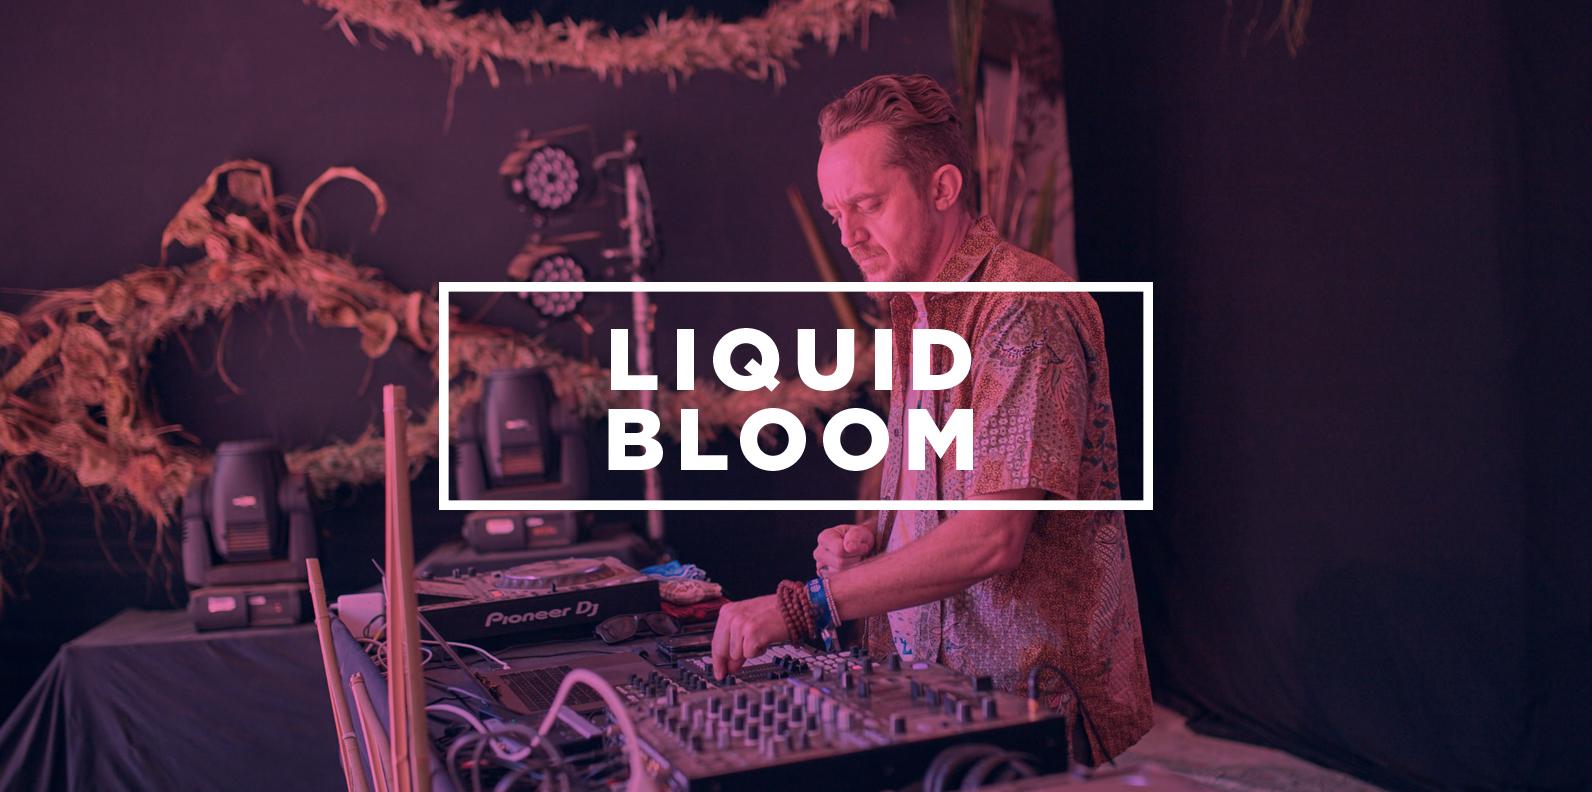 liquid bloom.jpg